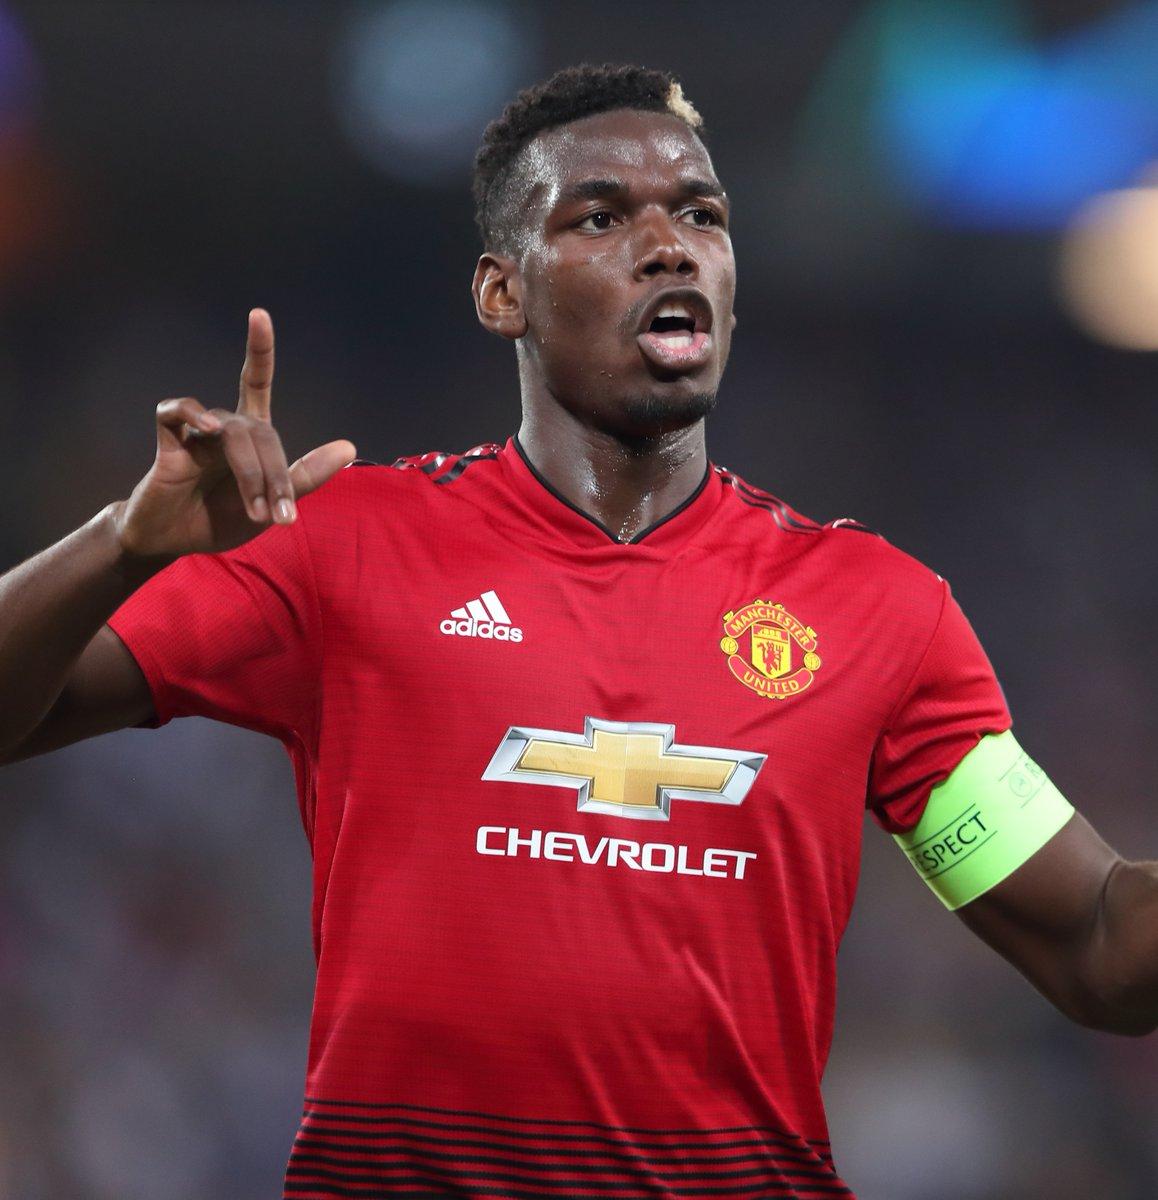 He 𝙝𝙞𝙩 that ☄️  🔴 #MUFC  ⚽ #GoalOfTheDay  🇫🇷 @PaulPogba